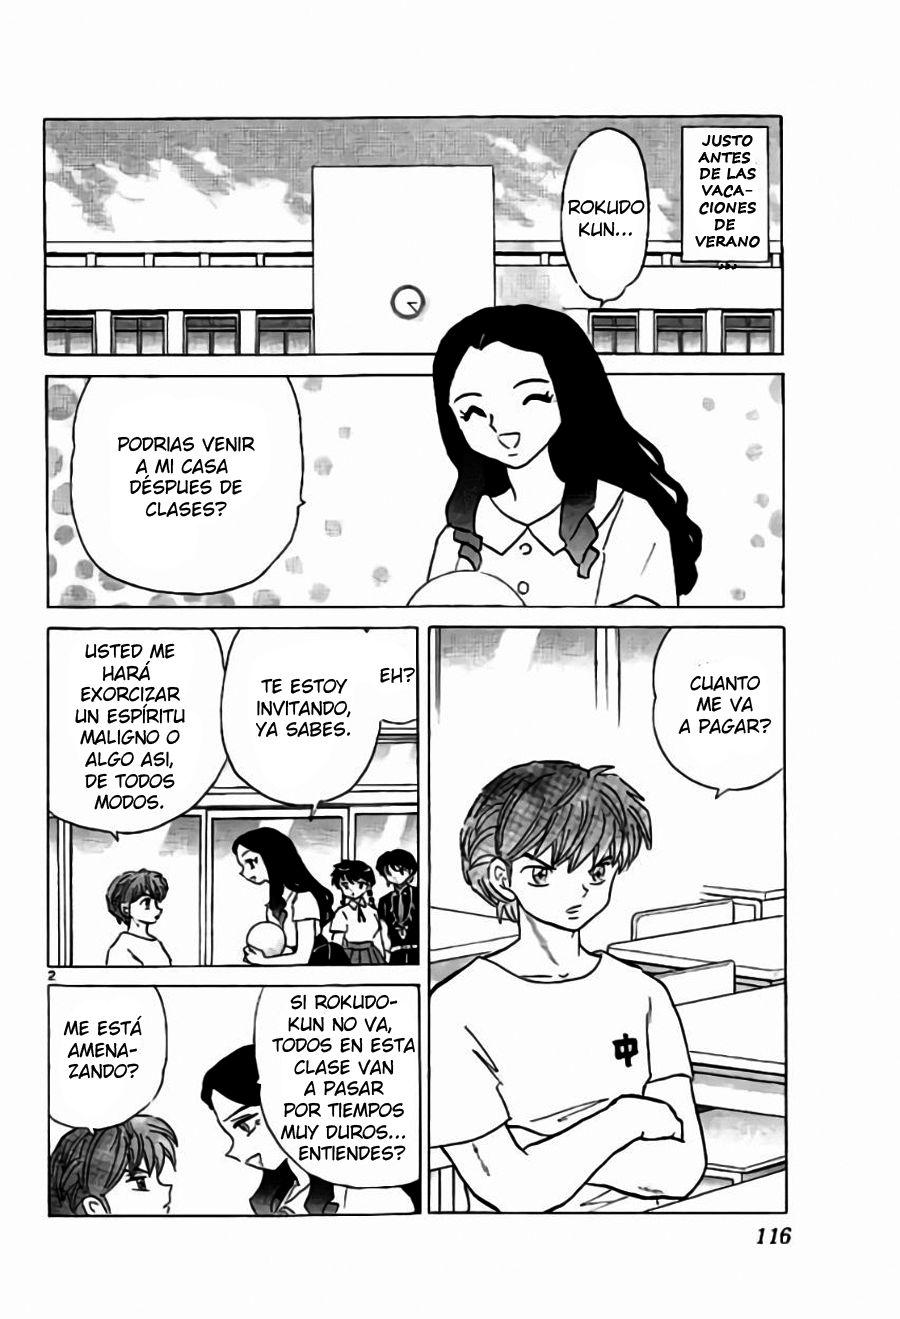 https://c5.ninemanga.com/es_manga/pic2/33/609/501810/5d4c2d20597f73dd33a058db352e3d57.jpg Page 3